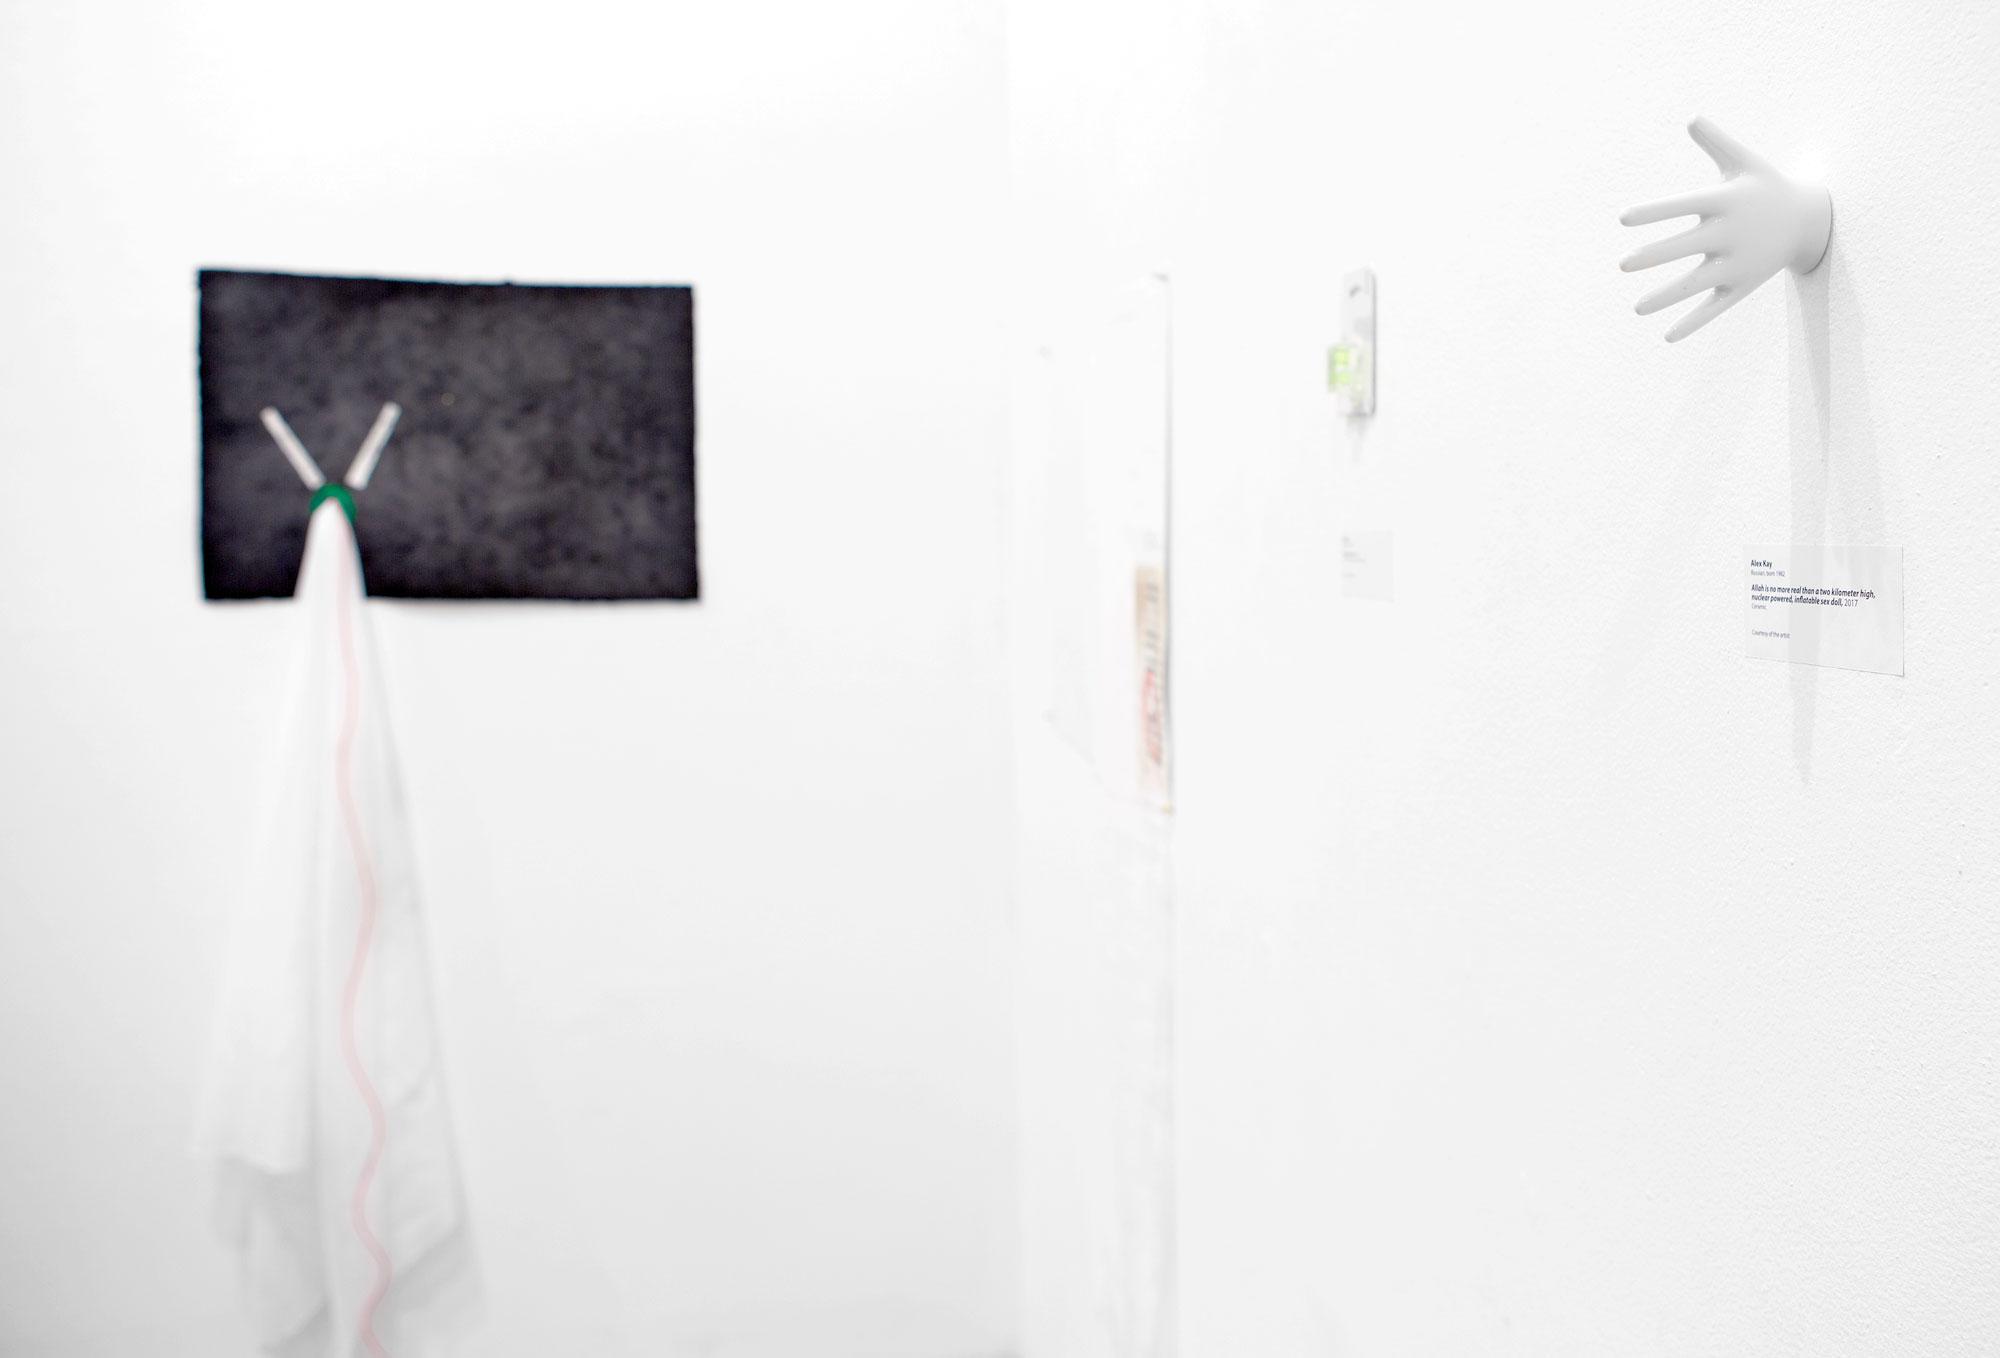 Meshki: Royal Black, Potato Sacks, i.e., Meaningmization, Exhibition View #3 by Alex Kay